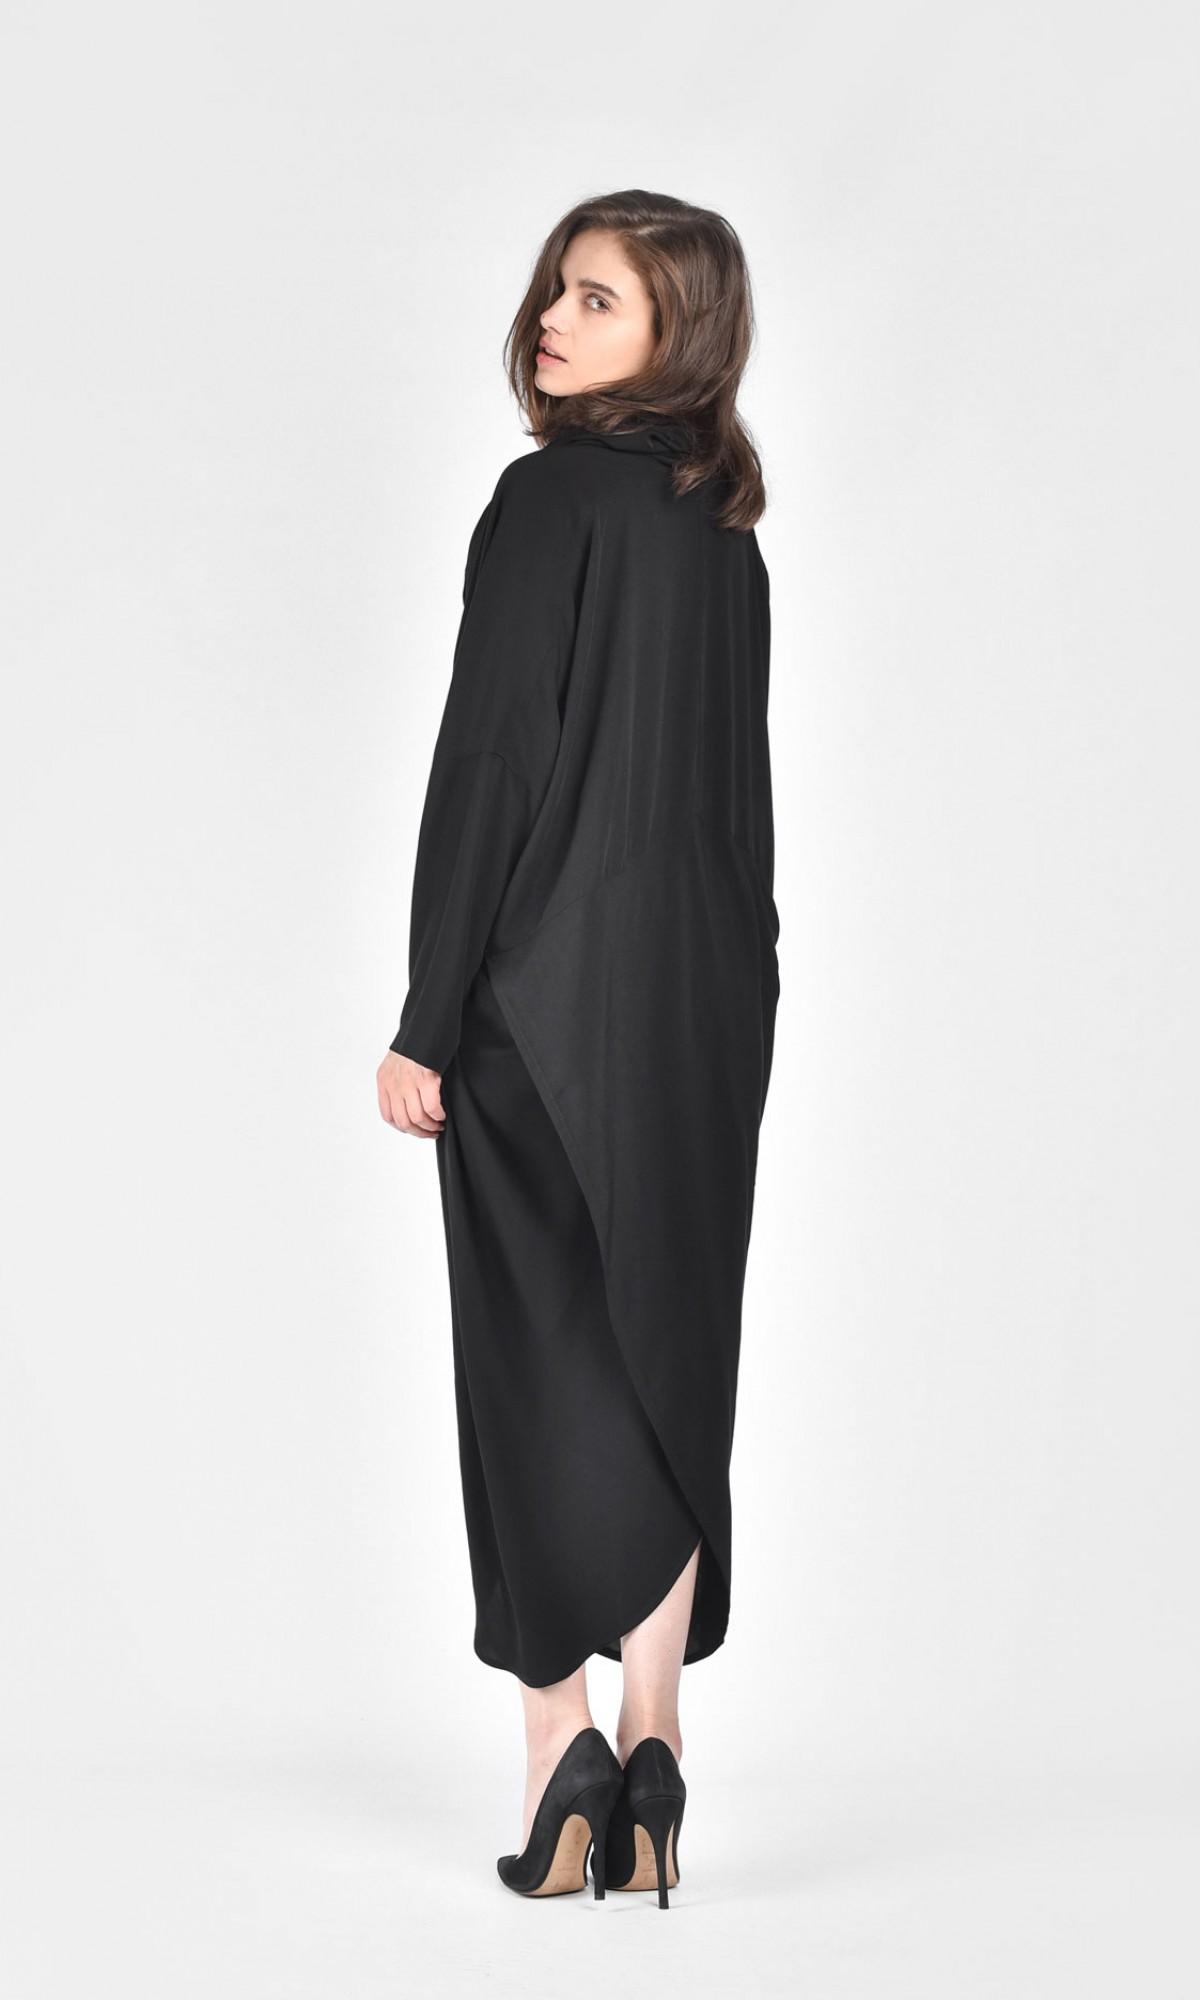 29f50adbcbcc1b Extravagant Shirt Hooded Dress A03730 Extravagant Shirt Hooded Dress A03730  ...